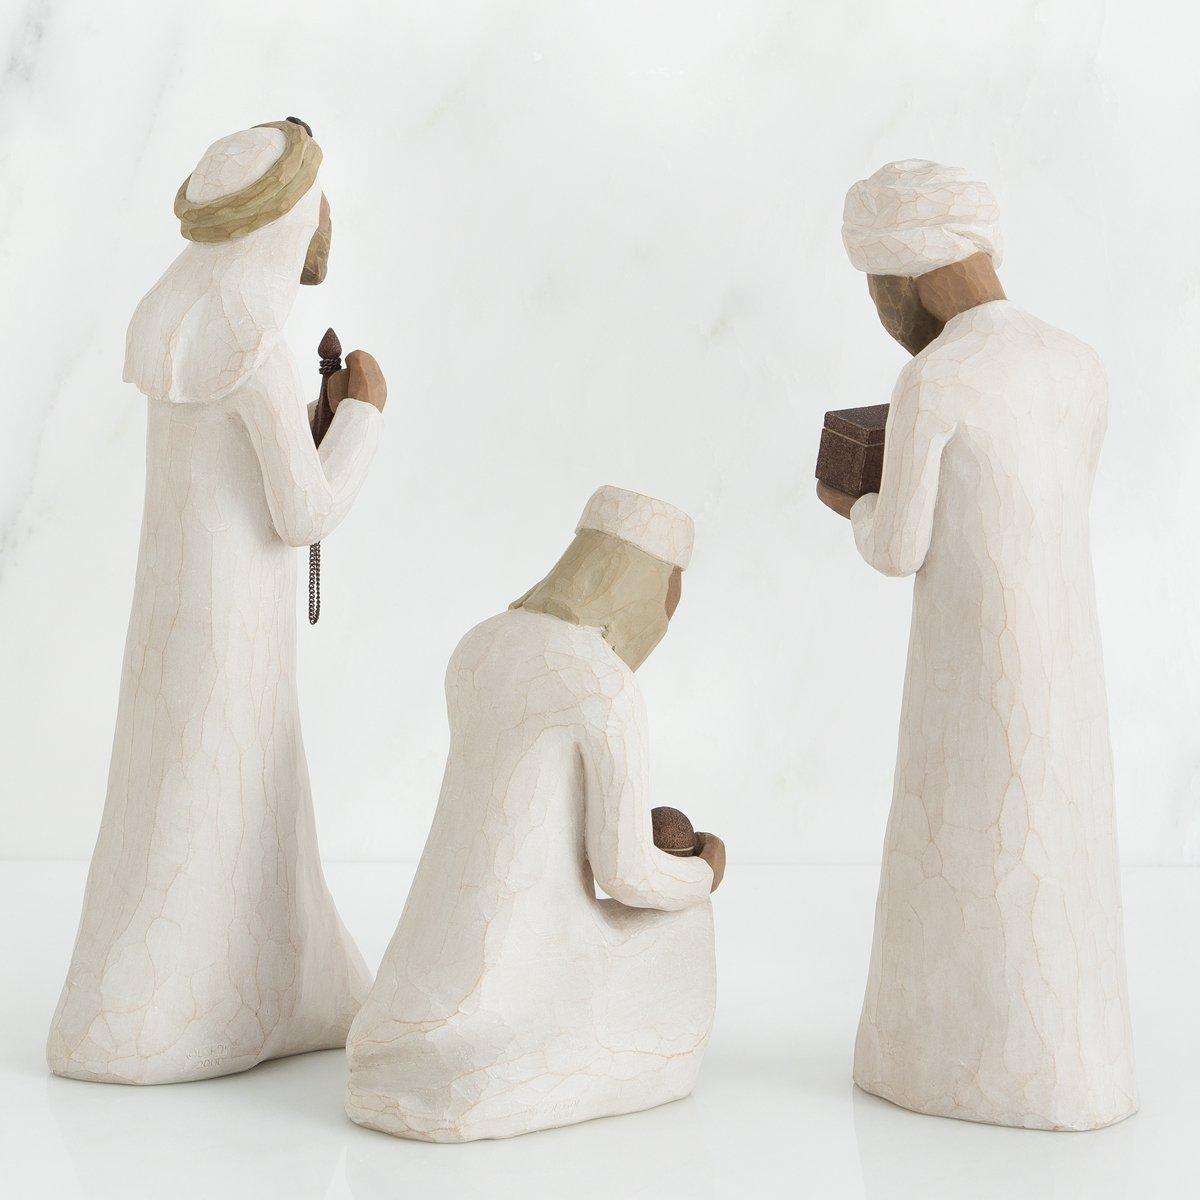 Willow Tree Figurillas Decorativas con dise/ño 22 x 1.1 cm Resina Blanco